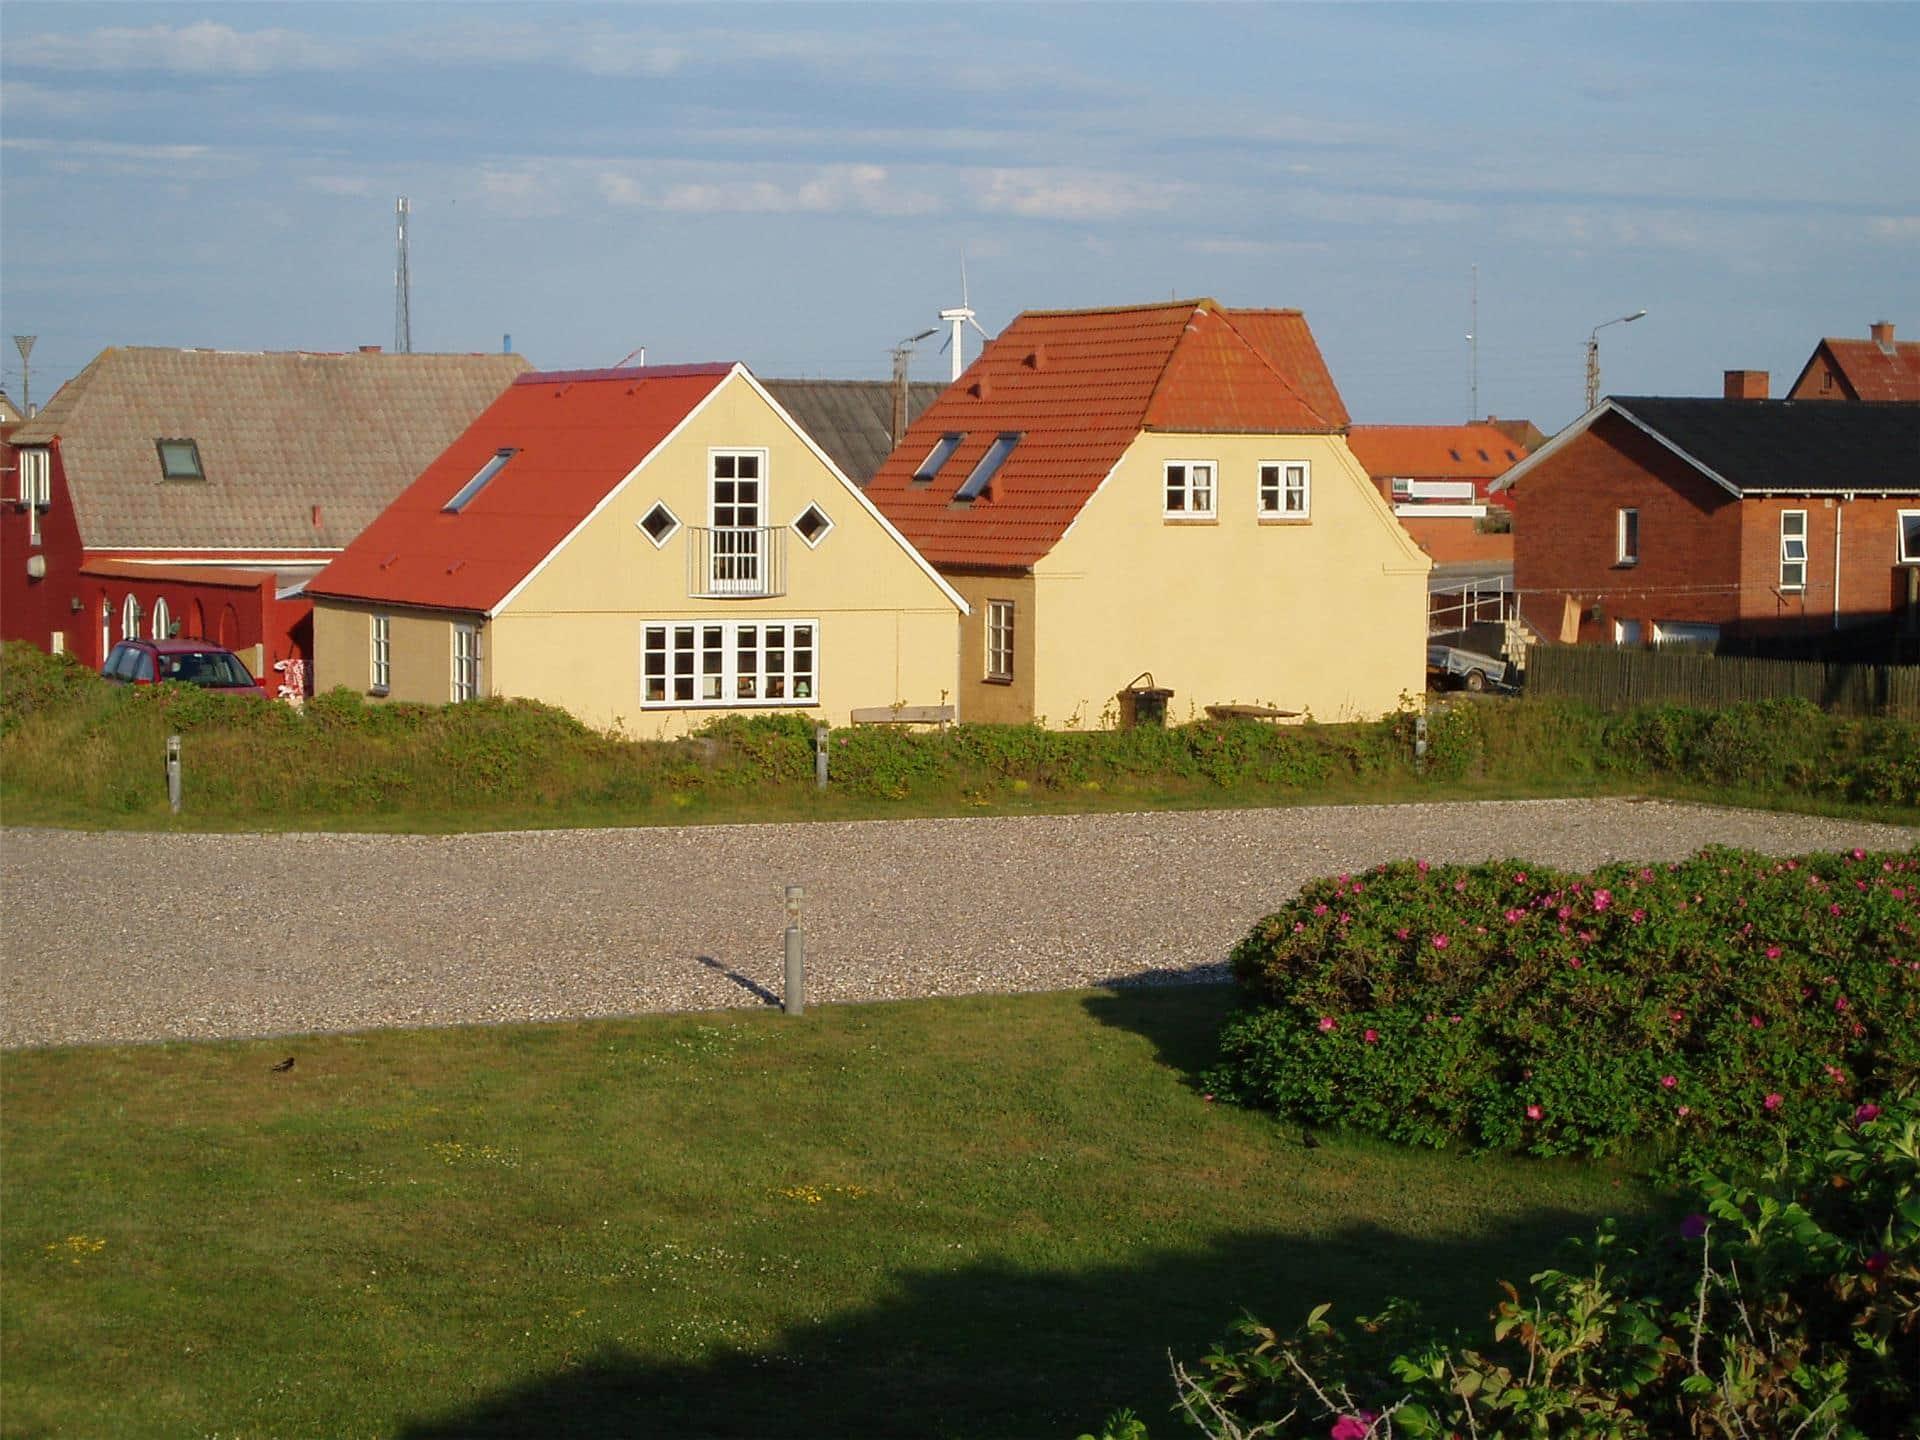 Bild 1-175 Ferienhaus 70421, Kirkevej 2, DK - 6990 Ulfborg